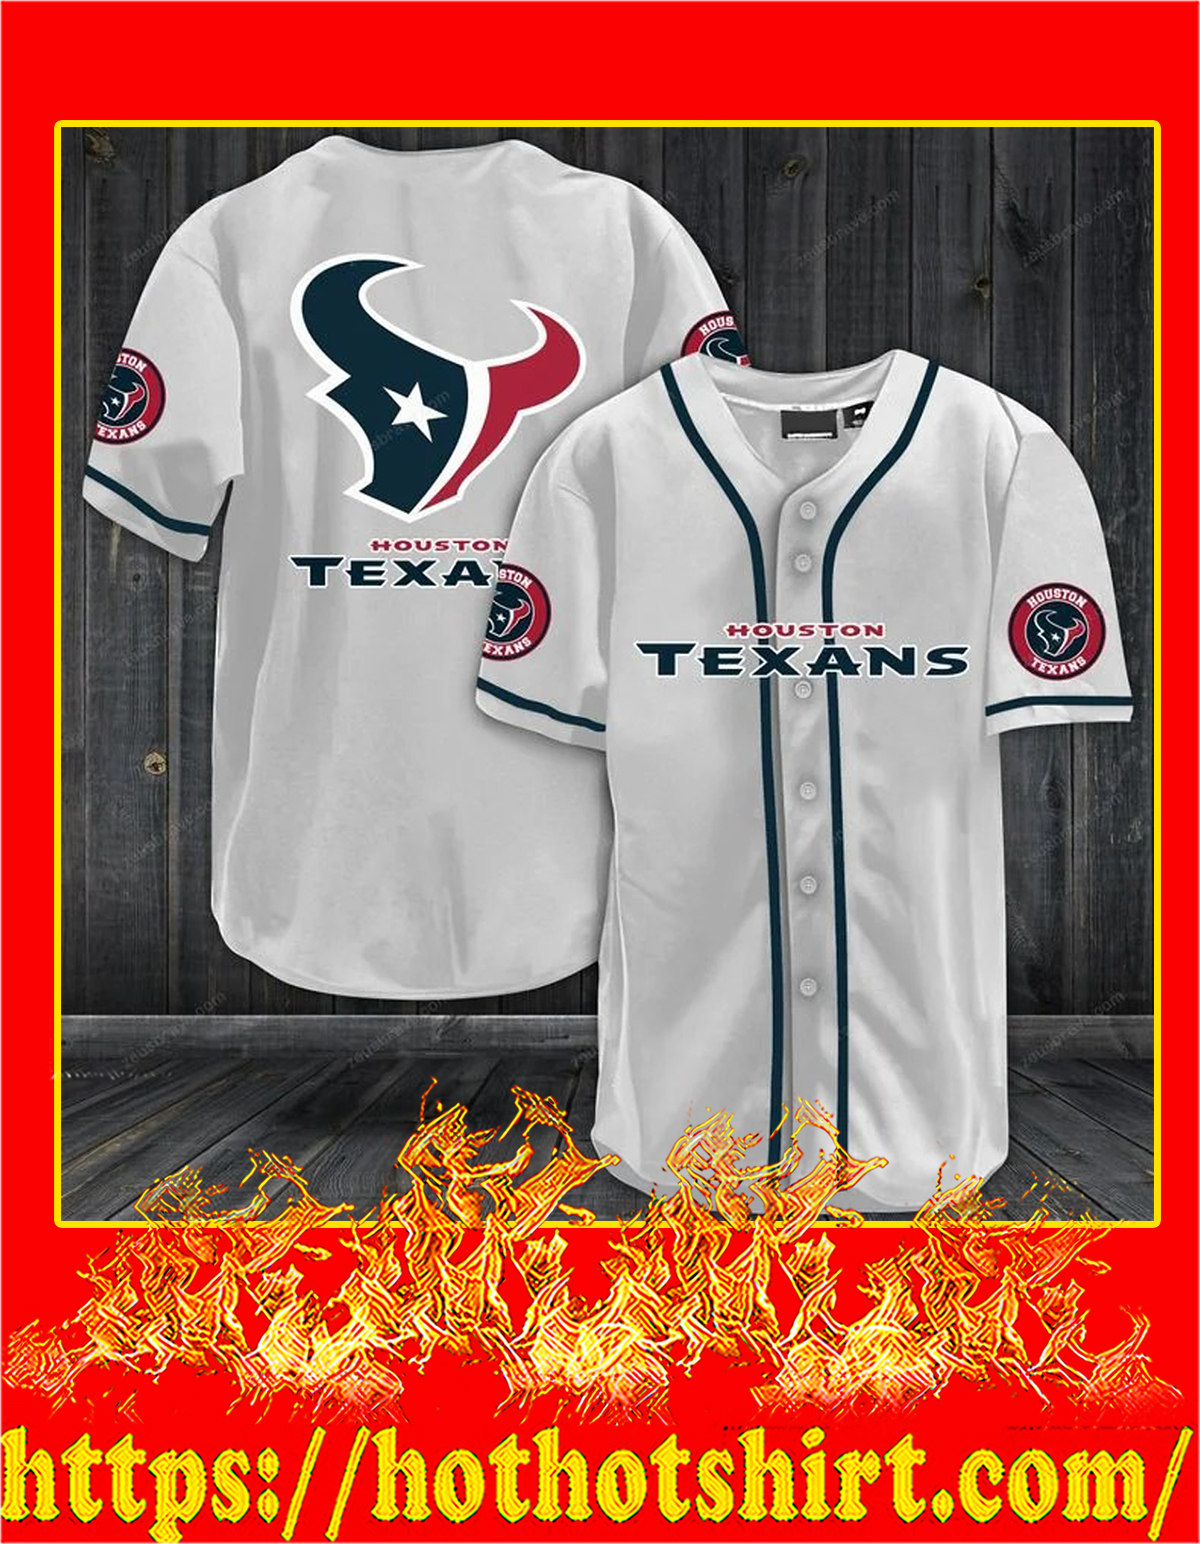 Houston texans hawaiian shirt - pic 1